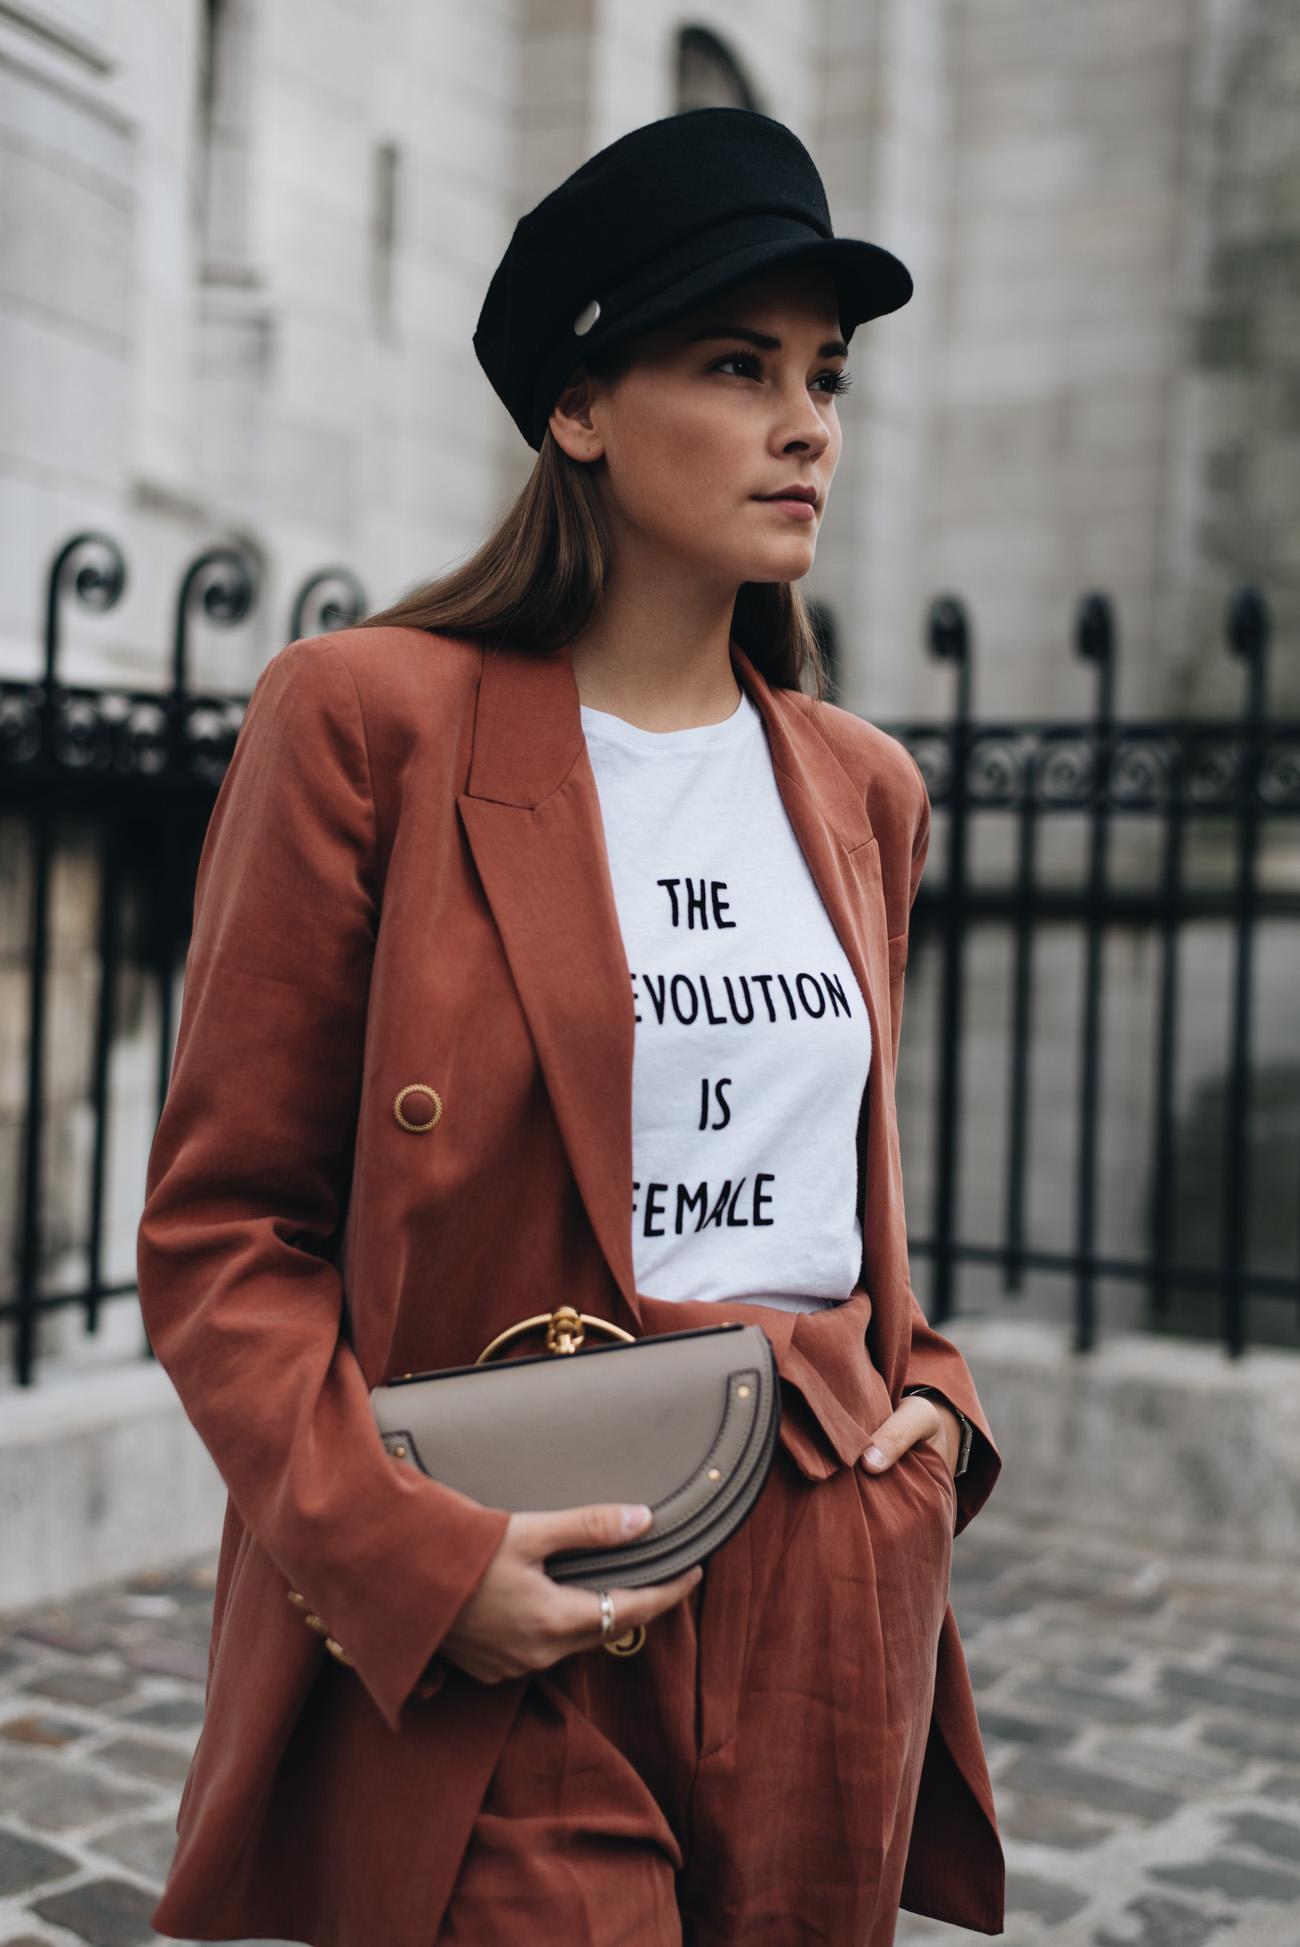 Fashion-trends-2017-streetstyle-chloé-nile-bag-tasche-stretch-stoff-turnschuhe-sneaker-bloggerin-nina-schwichtenberg-fashiioncarpet